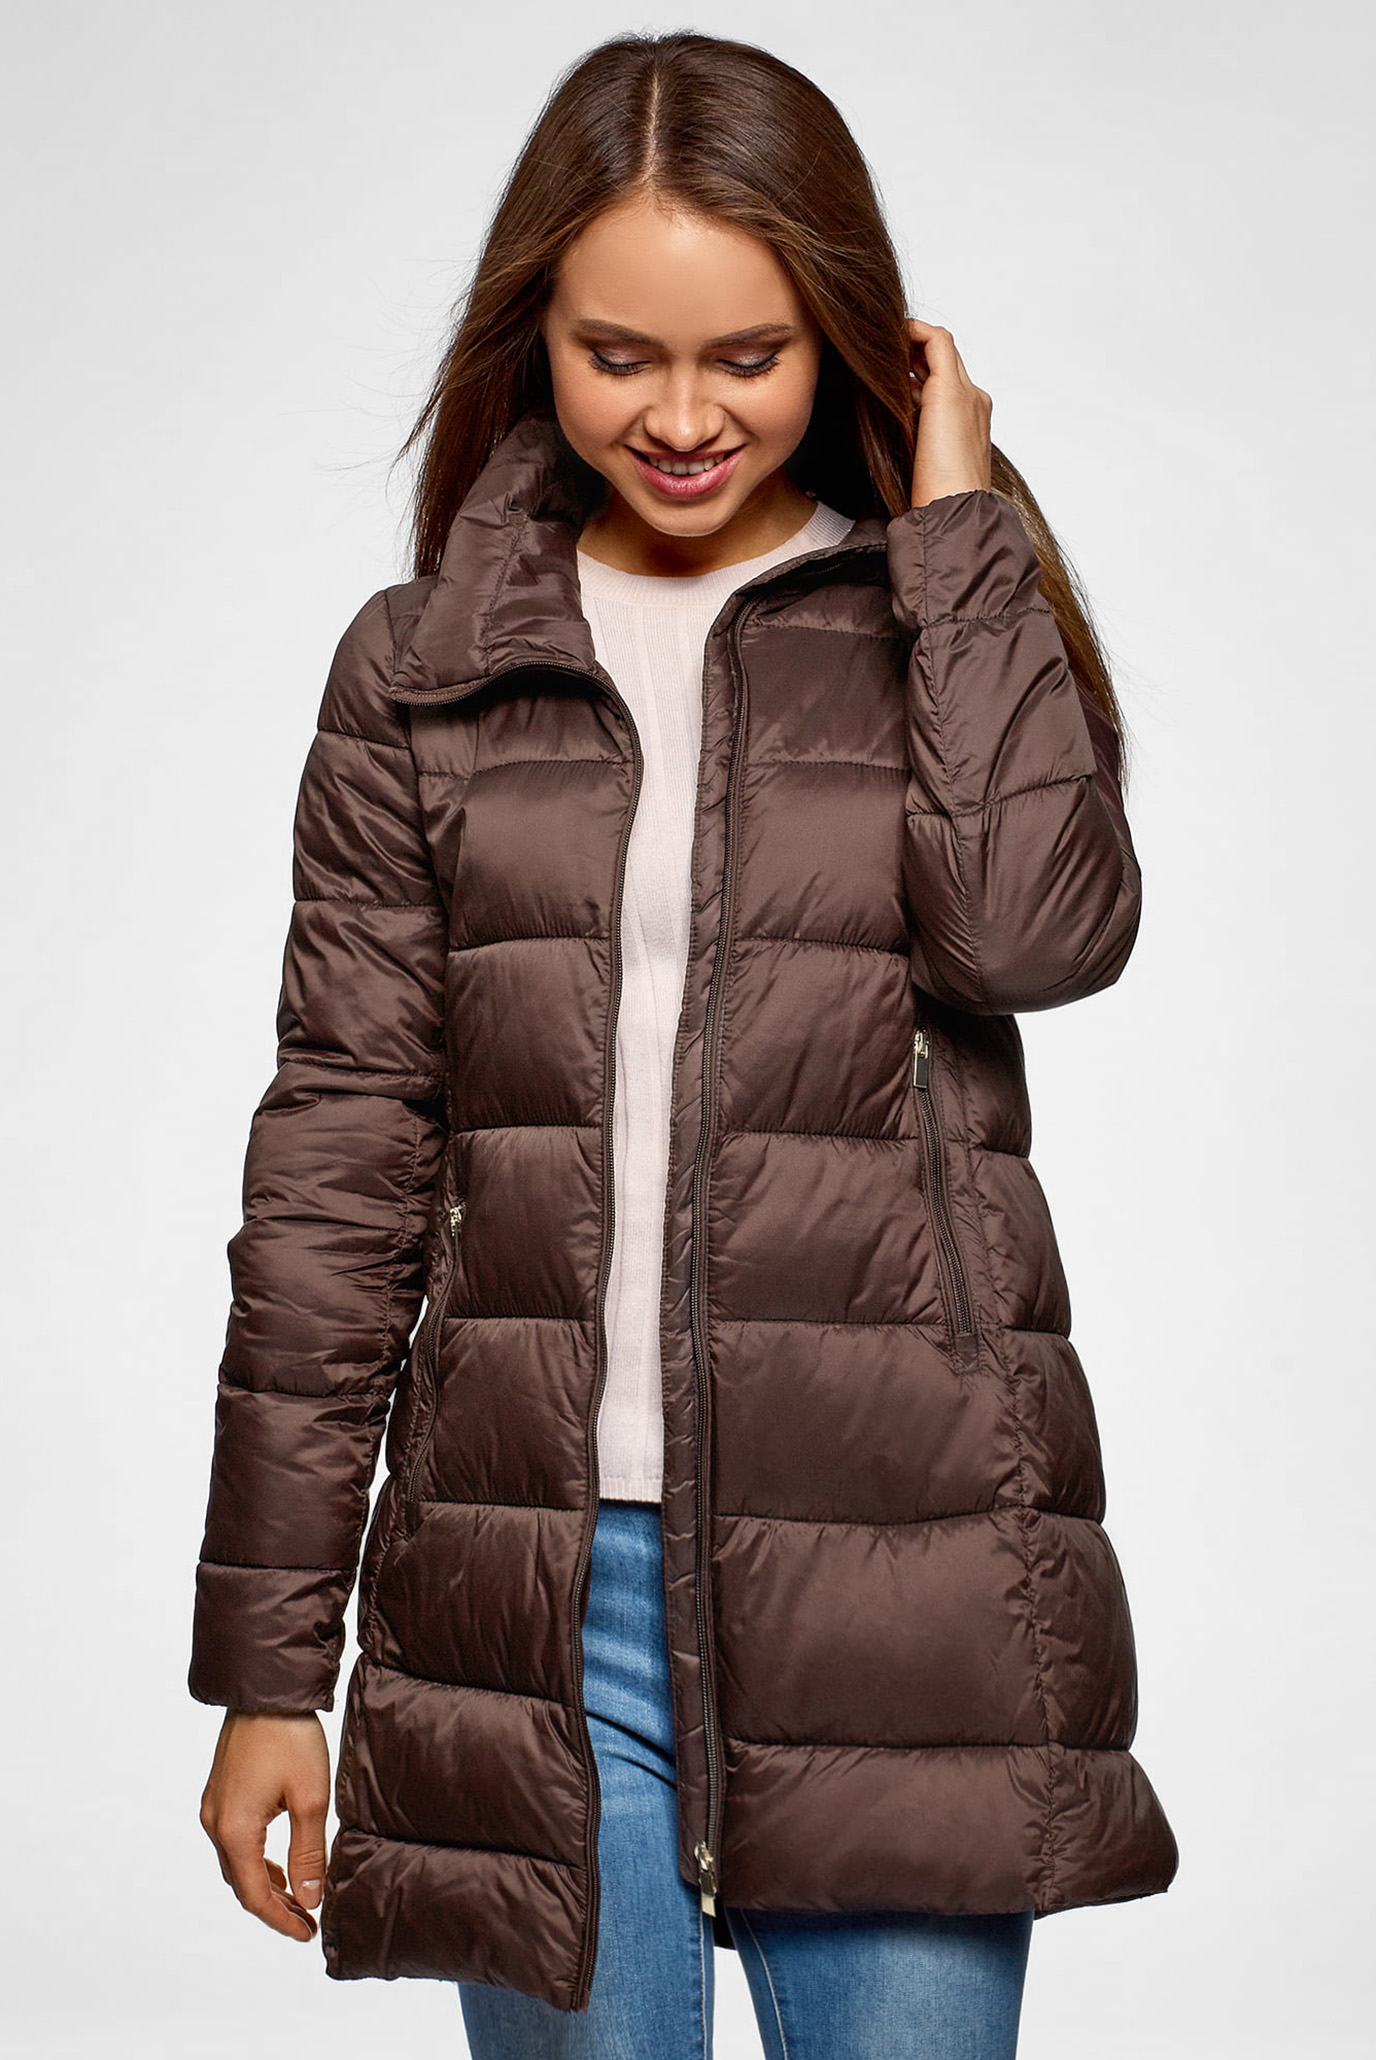 a2ca84ebbd1 Купить Женская коричневая куртка Oodji Oodji 10203055 45638 3900N – Киев